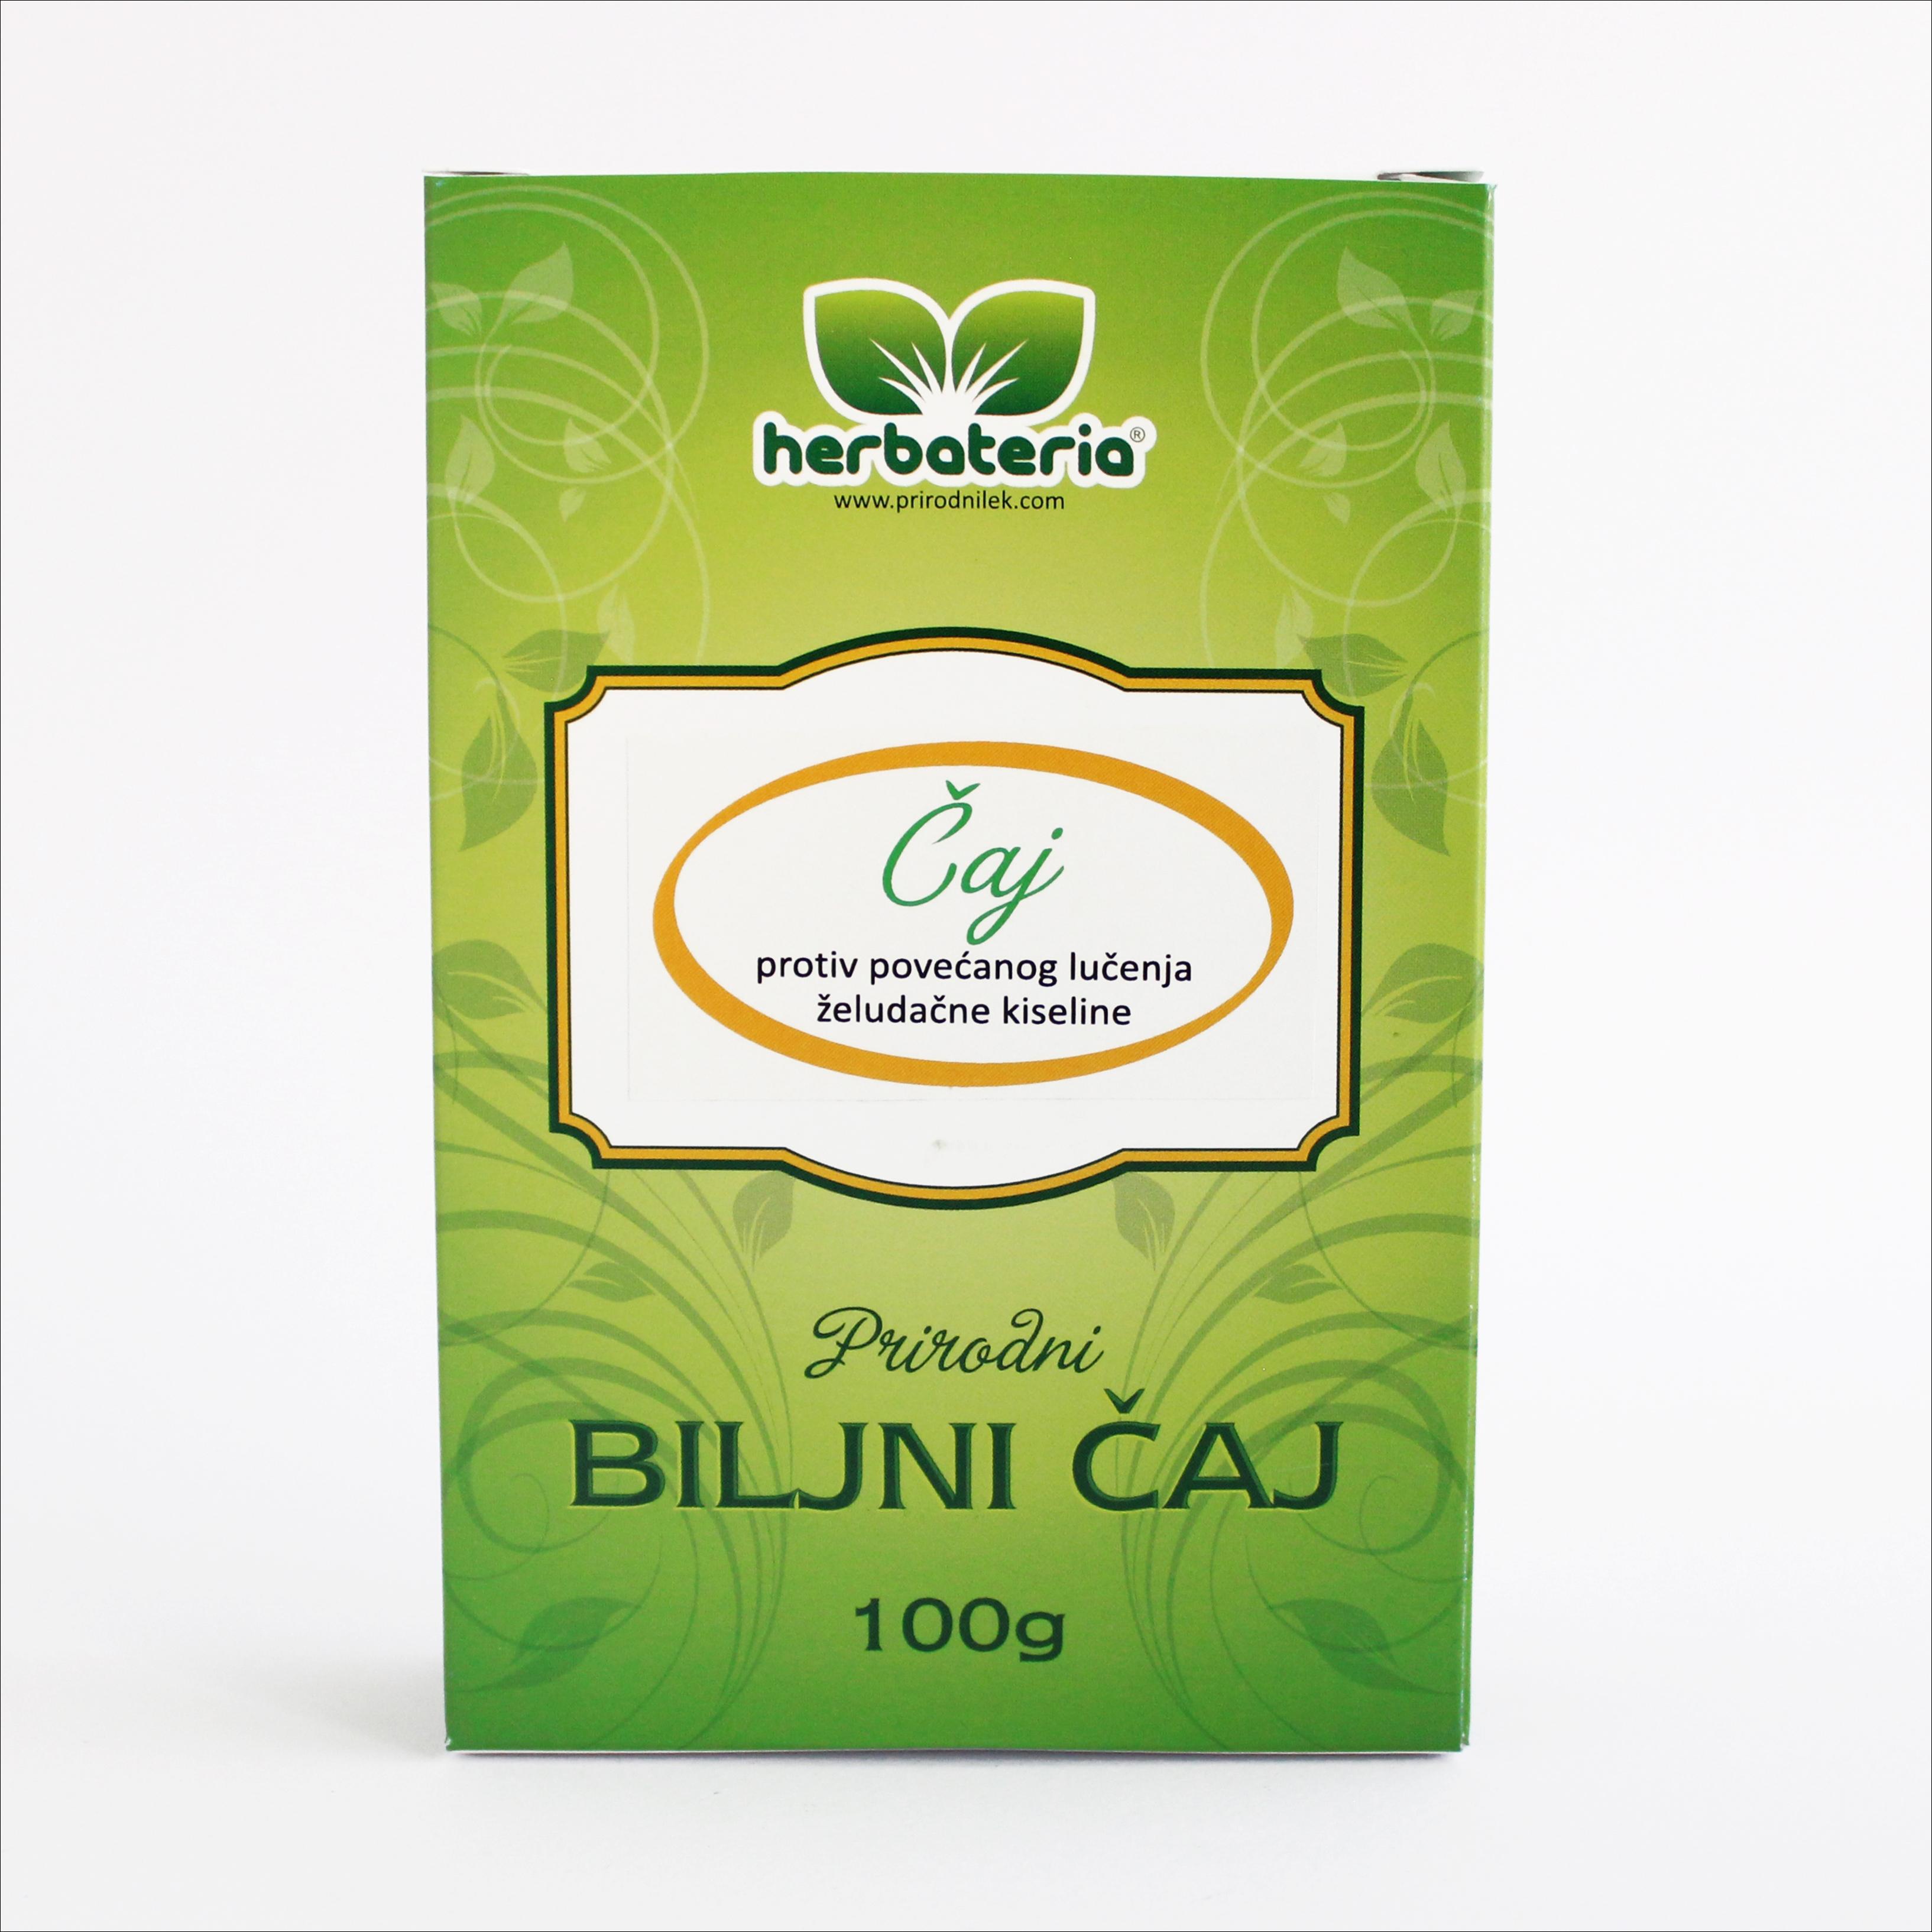 Herbateria - Čaj protiv povećanog lučenja želudačne kiseline 00064